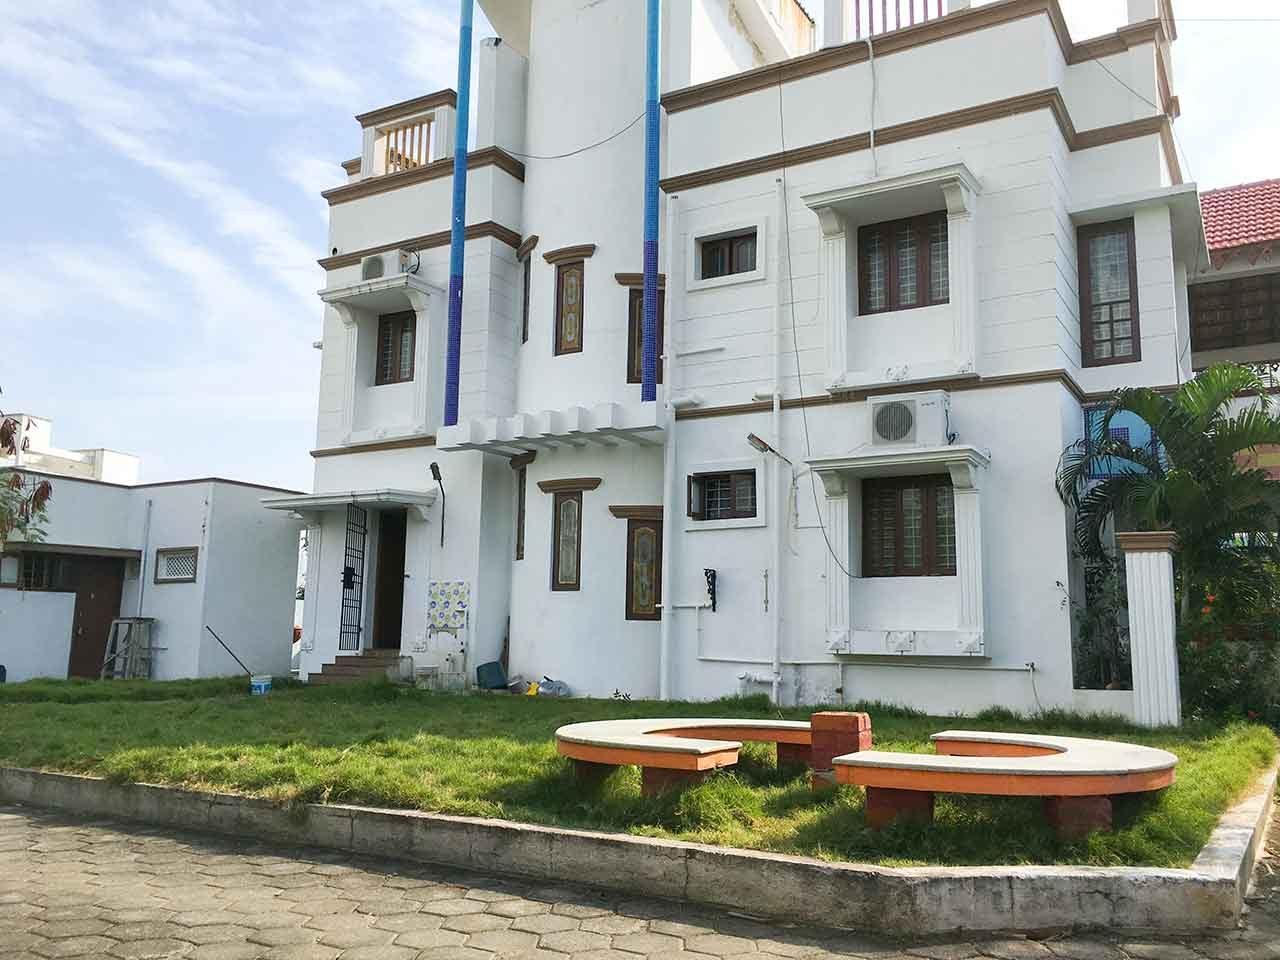 golden crest villa ecr chennai